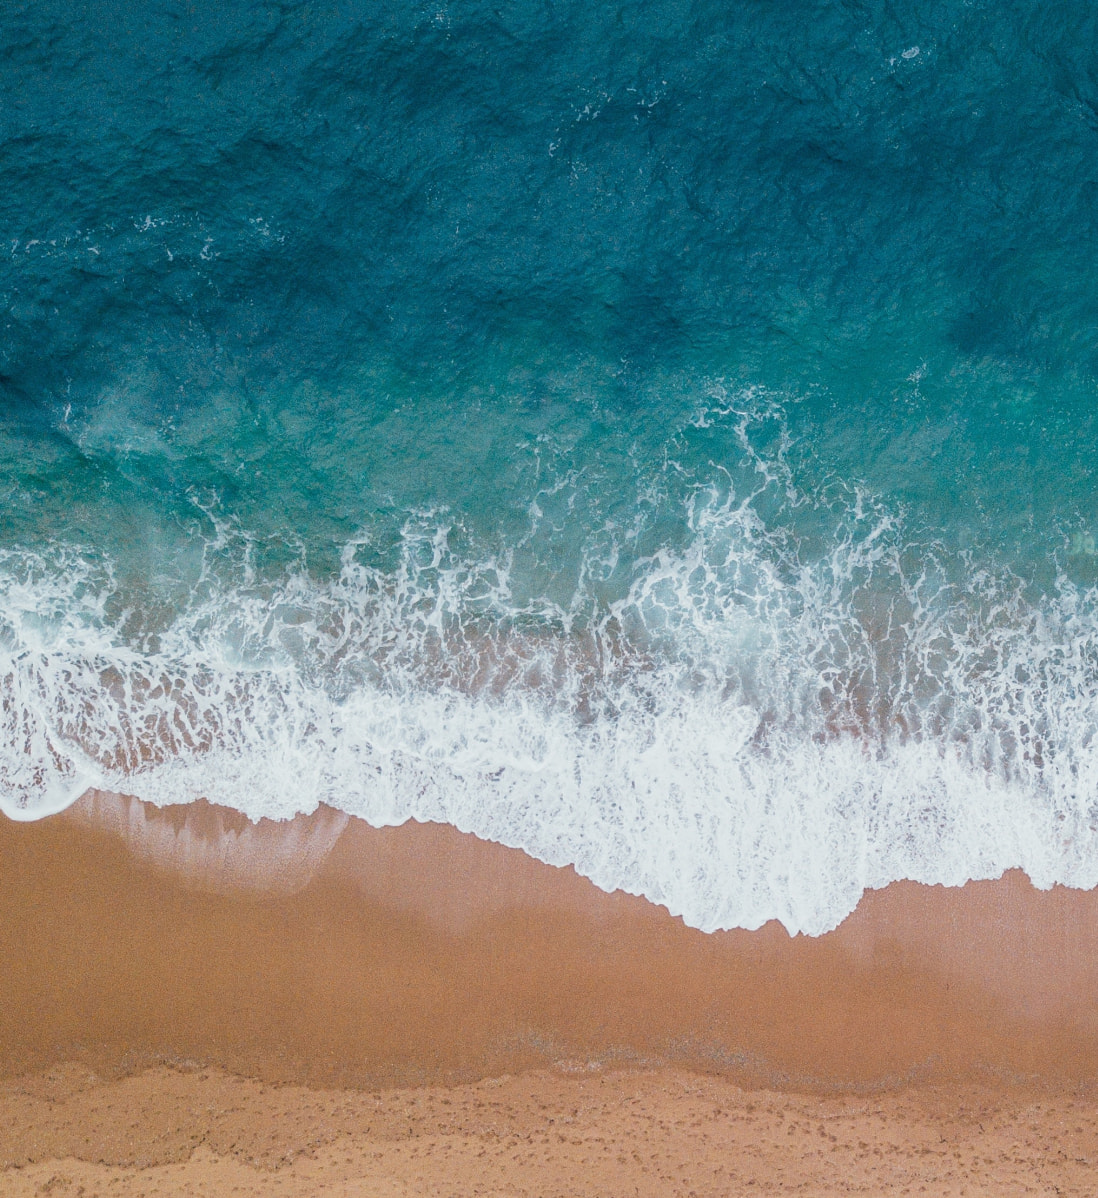 ocean-image